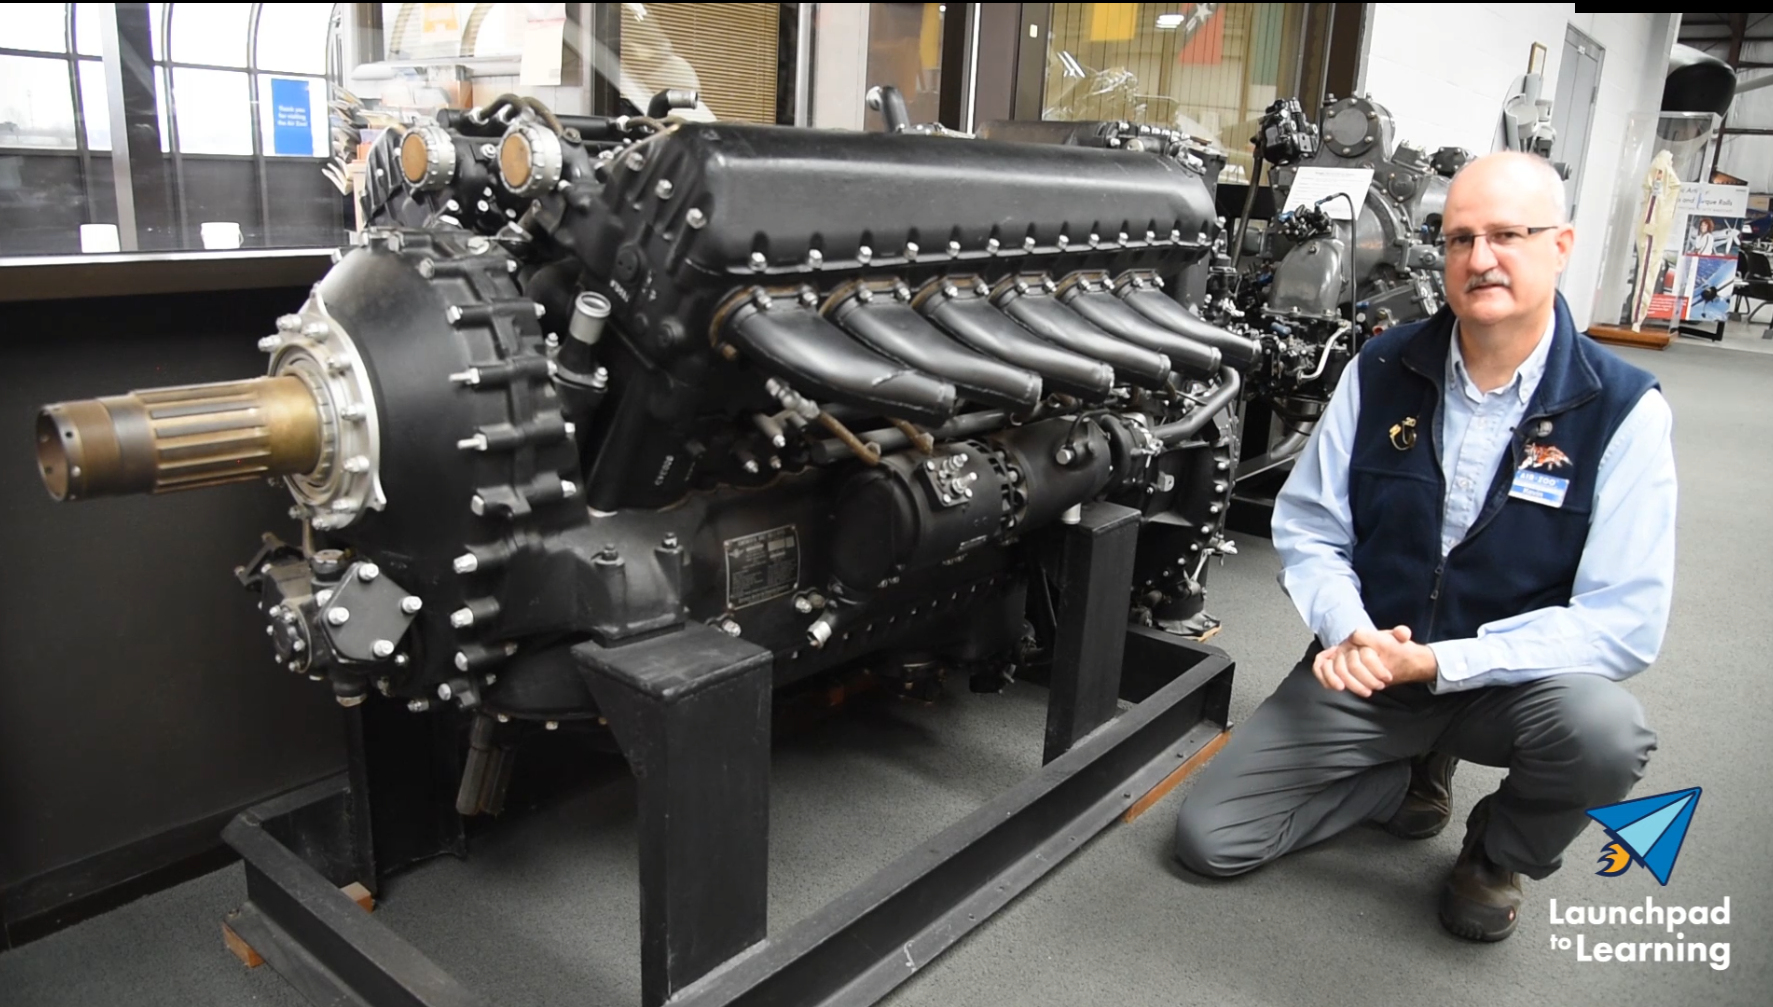 Continental Built Rolls Royce Merlin Engine image